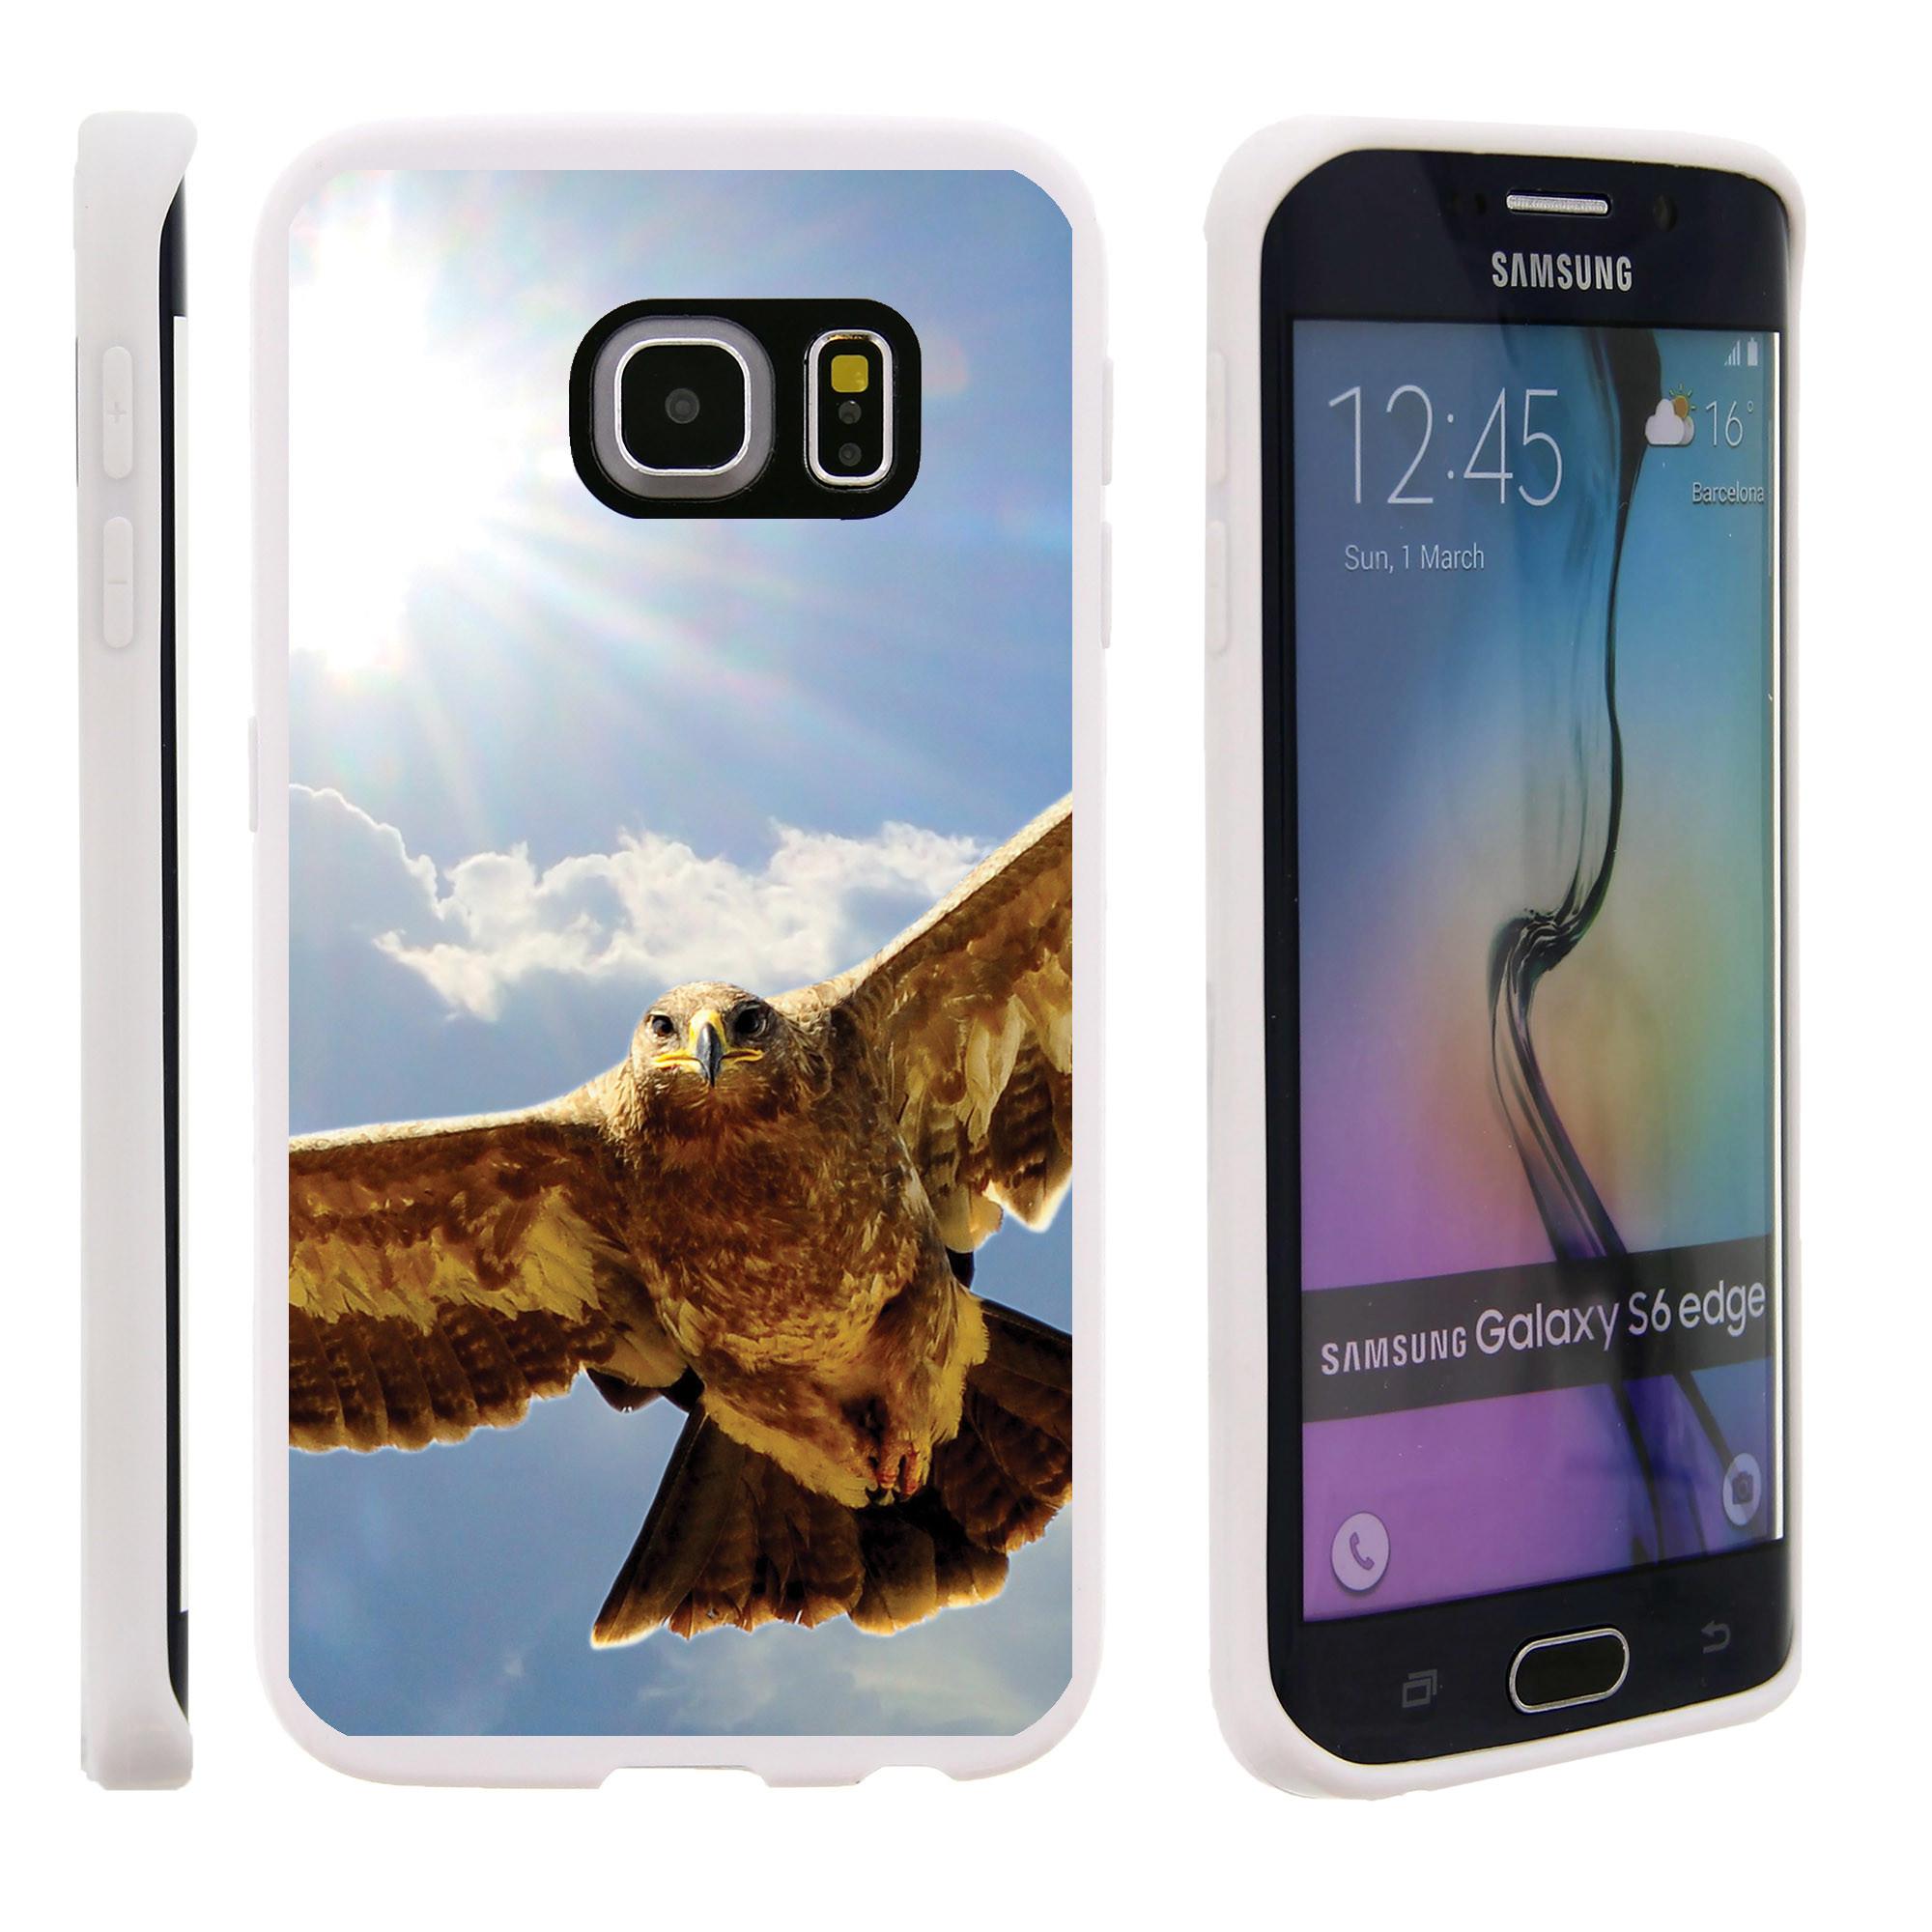 Samsung Galaxy S6 Edge G925, Flexible Case [FLEX FORCE] Slim Durable TPU Sleek Bumper with Unique Designs - Eagle Flying